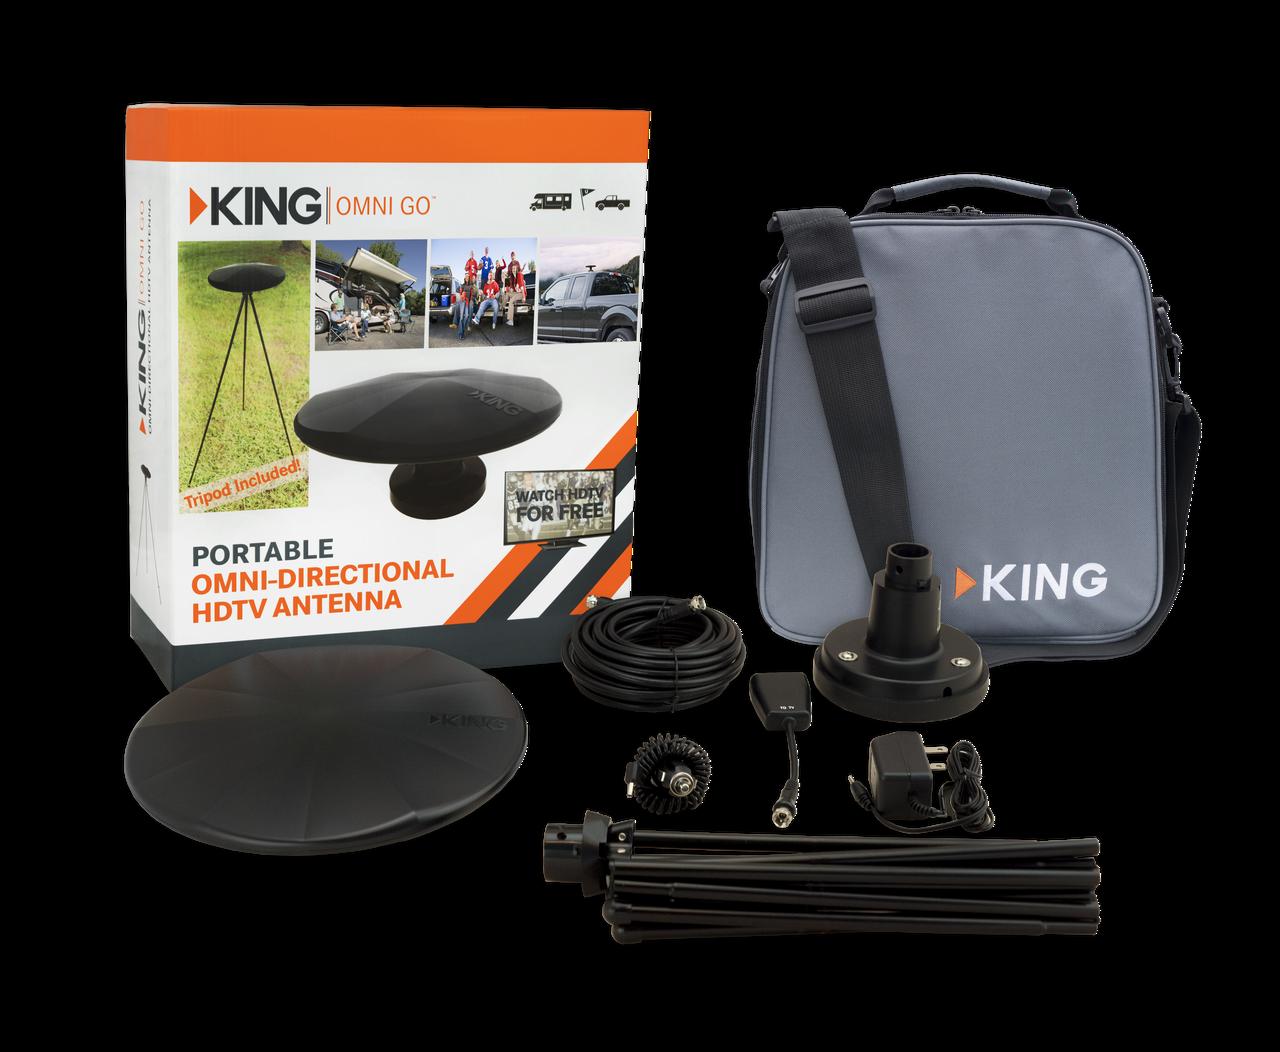 KING OmniGo™ - Factory Refurbished - Portable OmniDirectional OTA HDTV Antenna